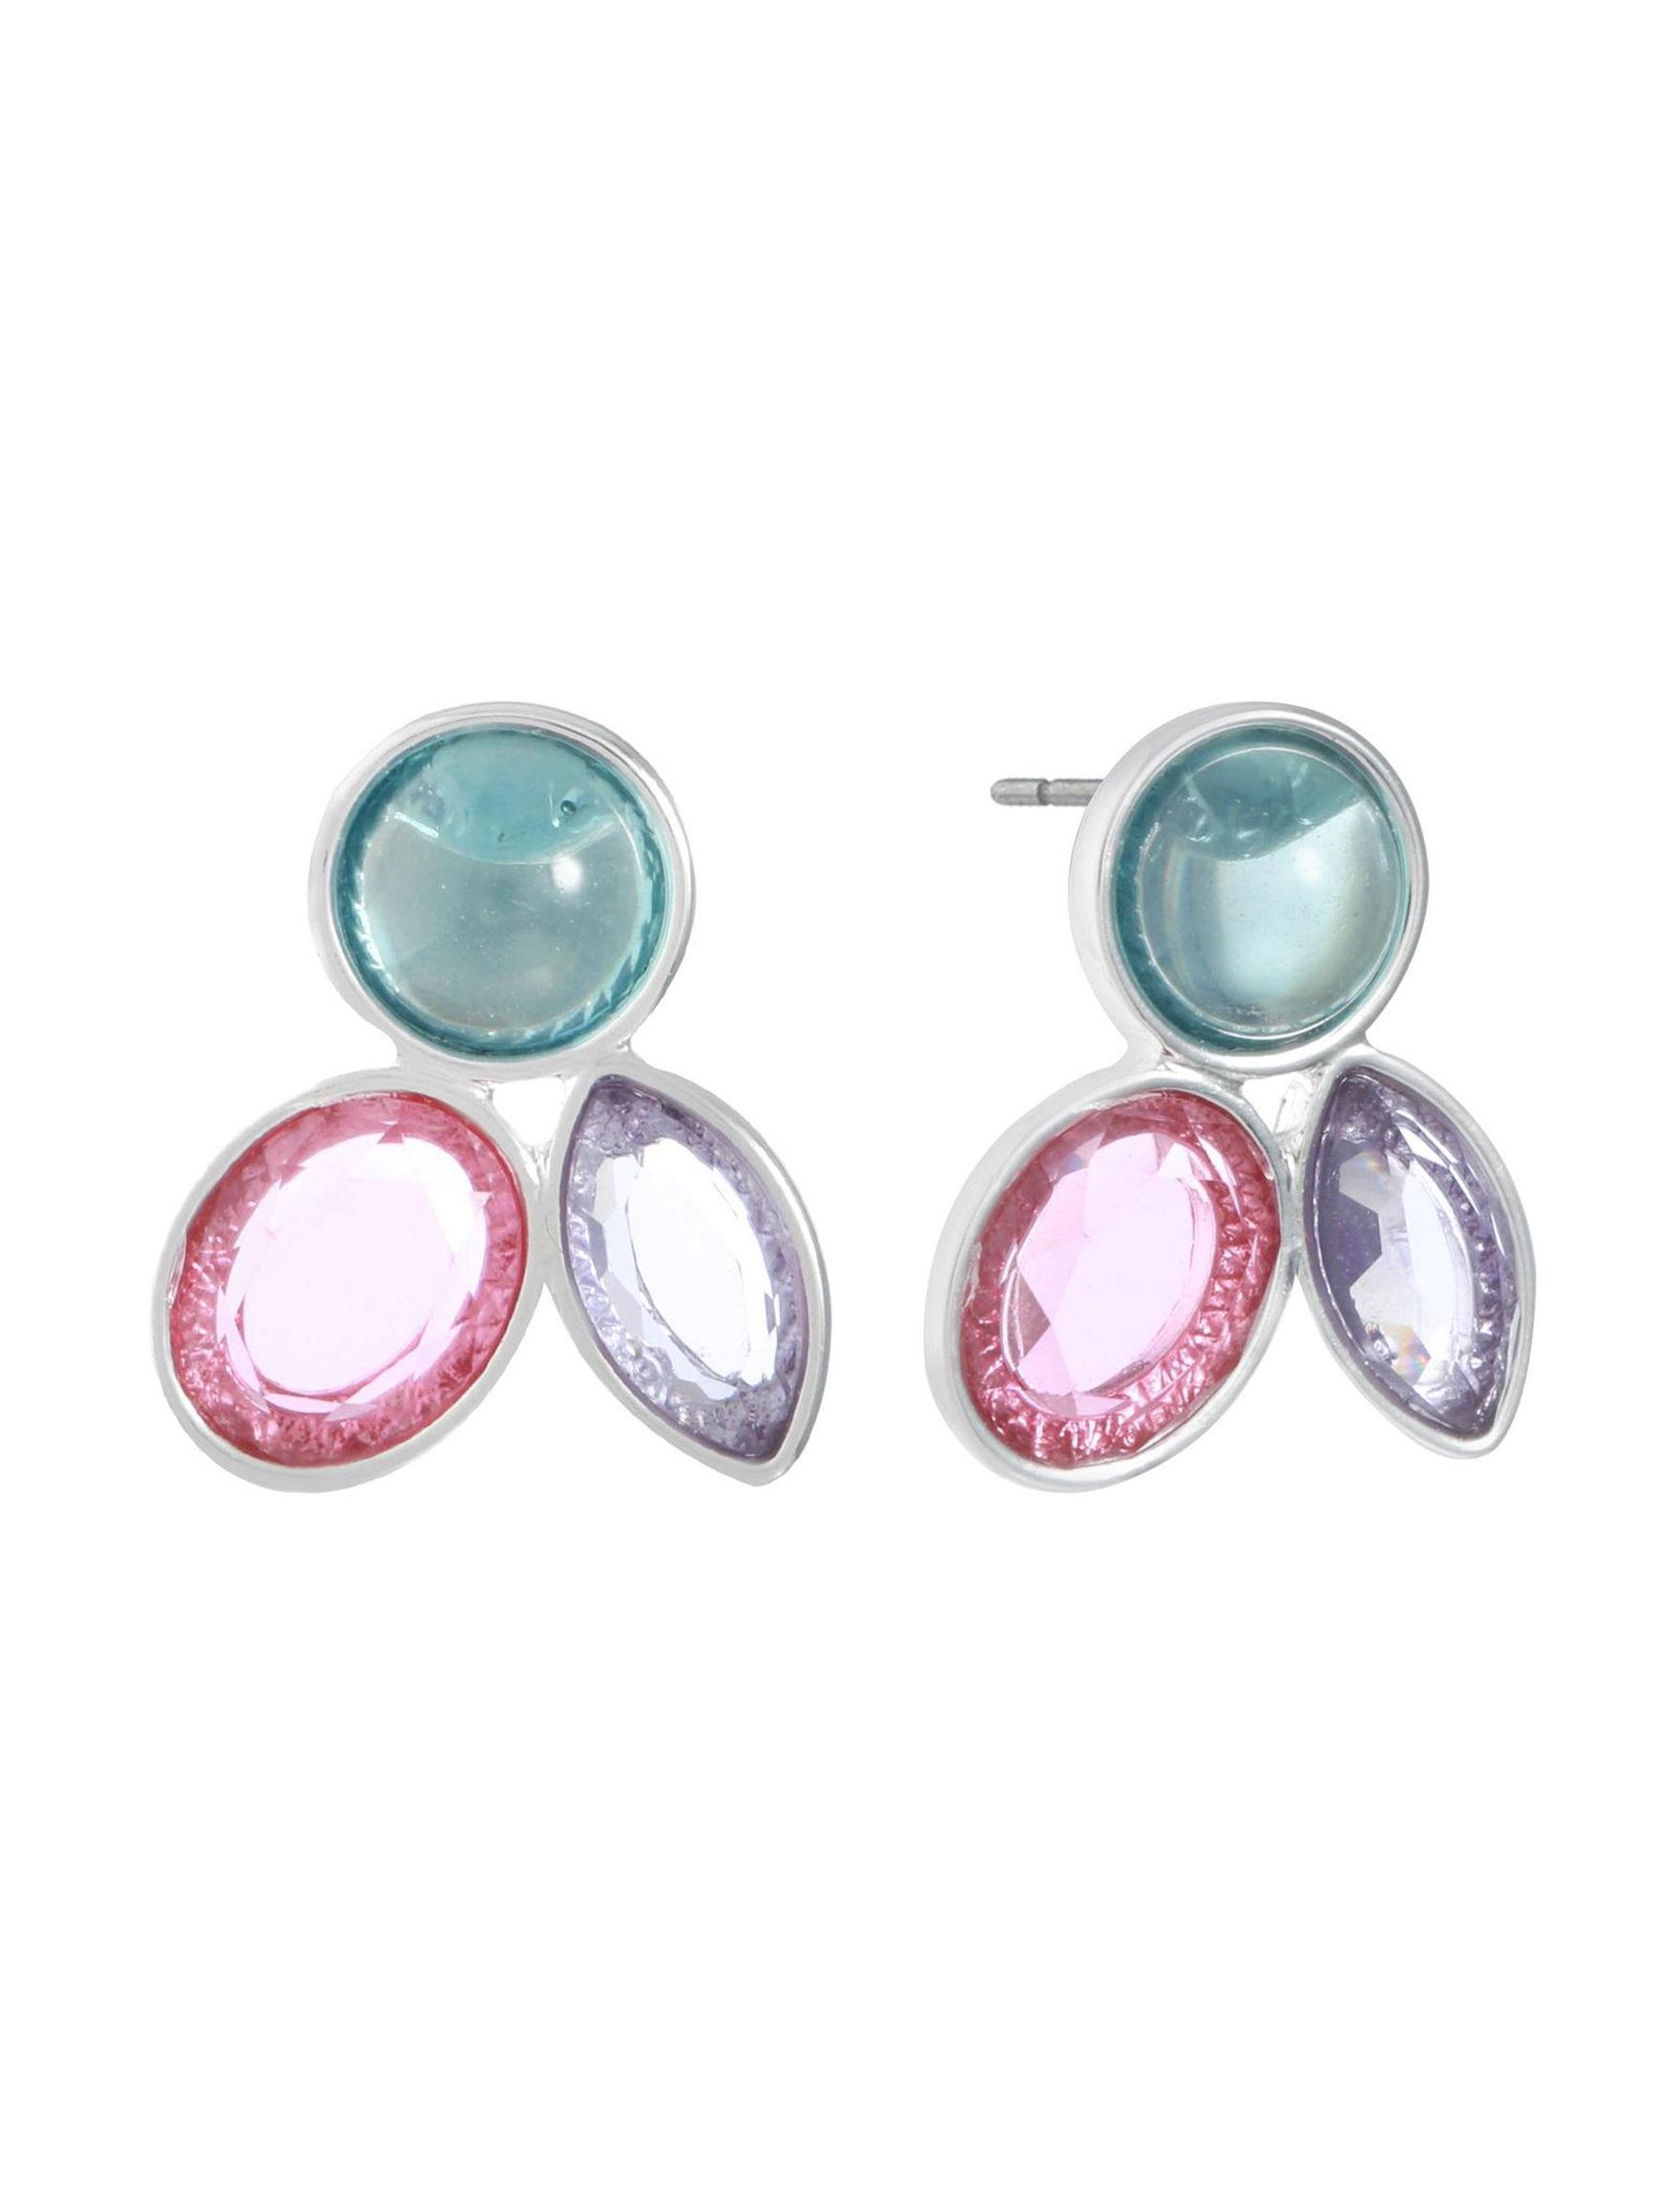 Gloria Vanderbilt Silver / Multi Studs Earrings Fashion Jewelry